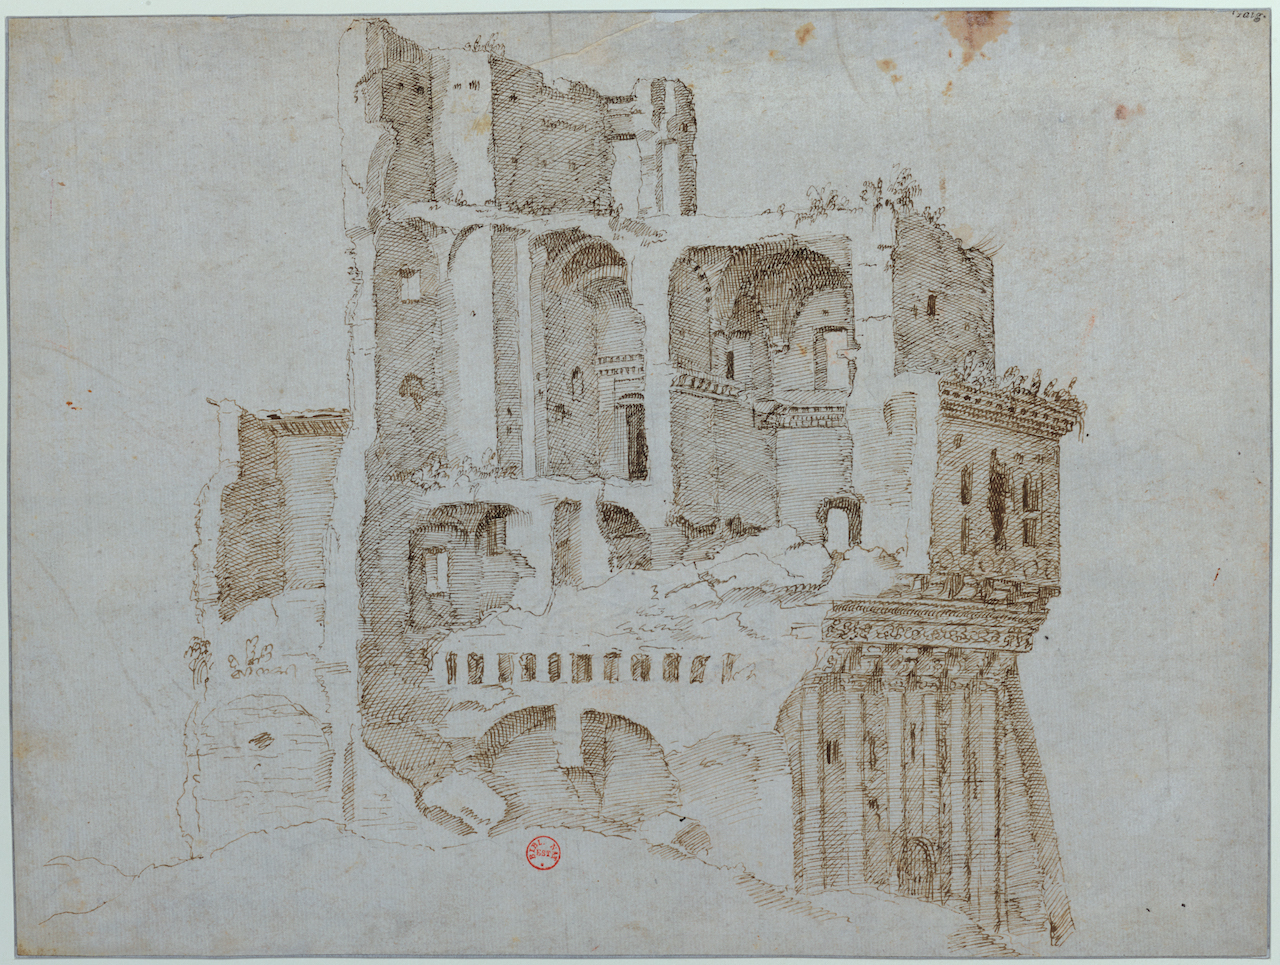 Maarten van Heemskerck, Les ruines de la Casa dei Crescenzi, entre 1532 et 1536, dessin. © Paris, Bibliothèque nationale de France.